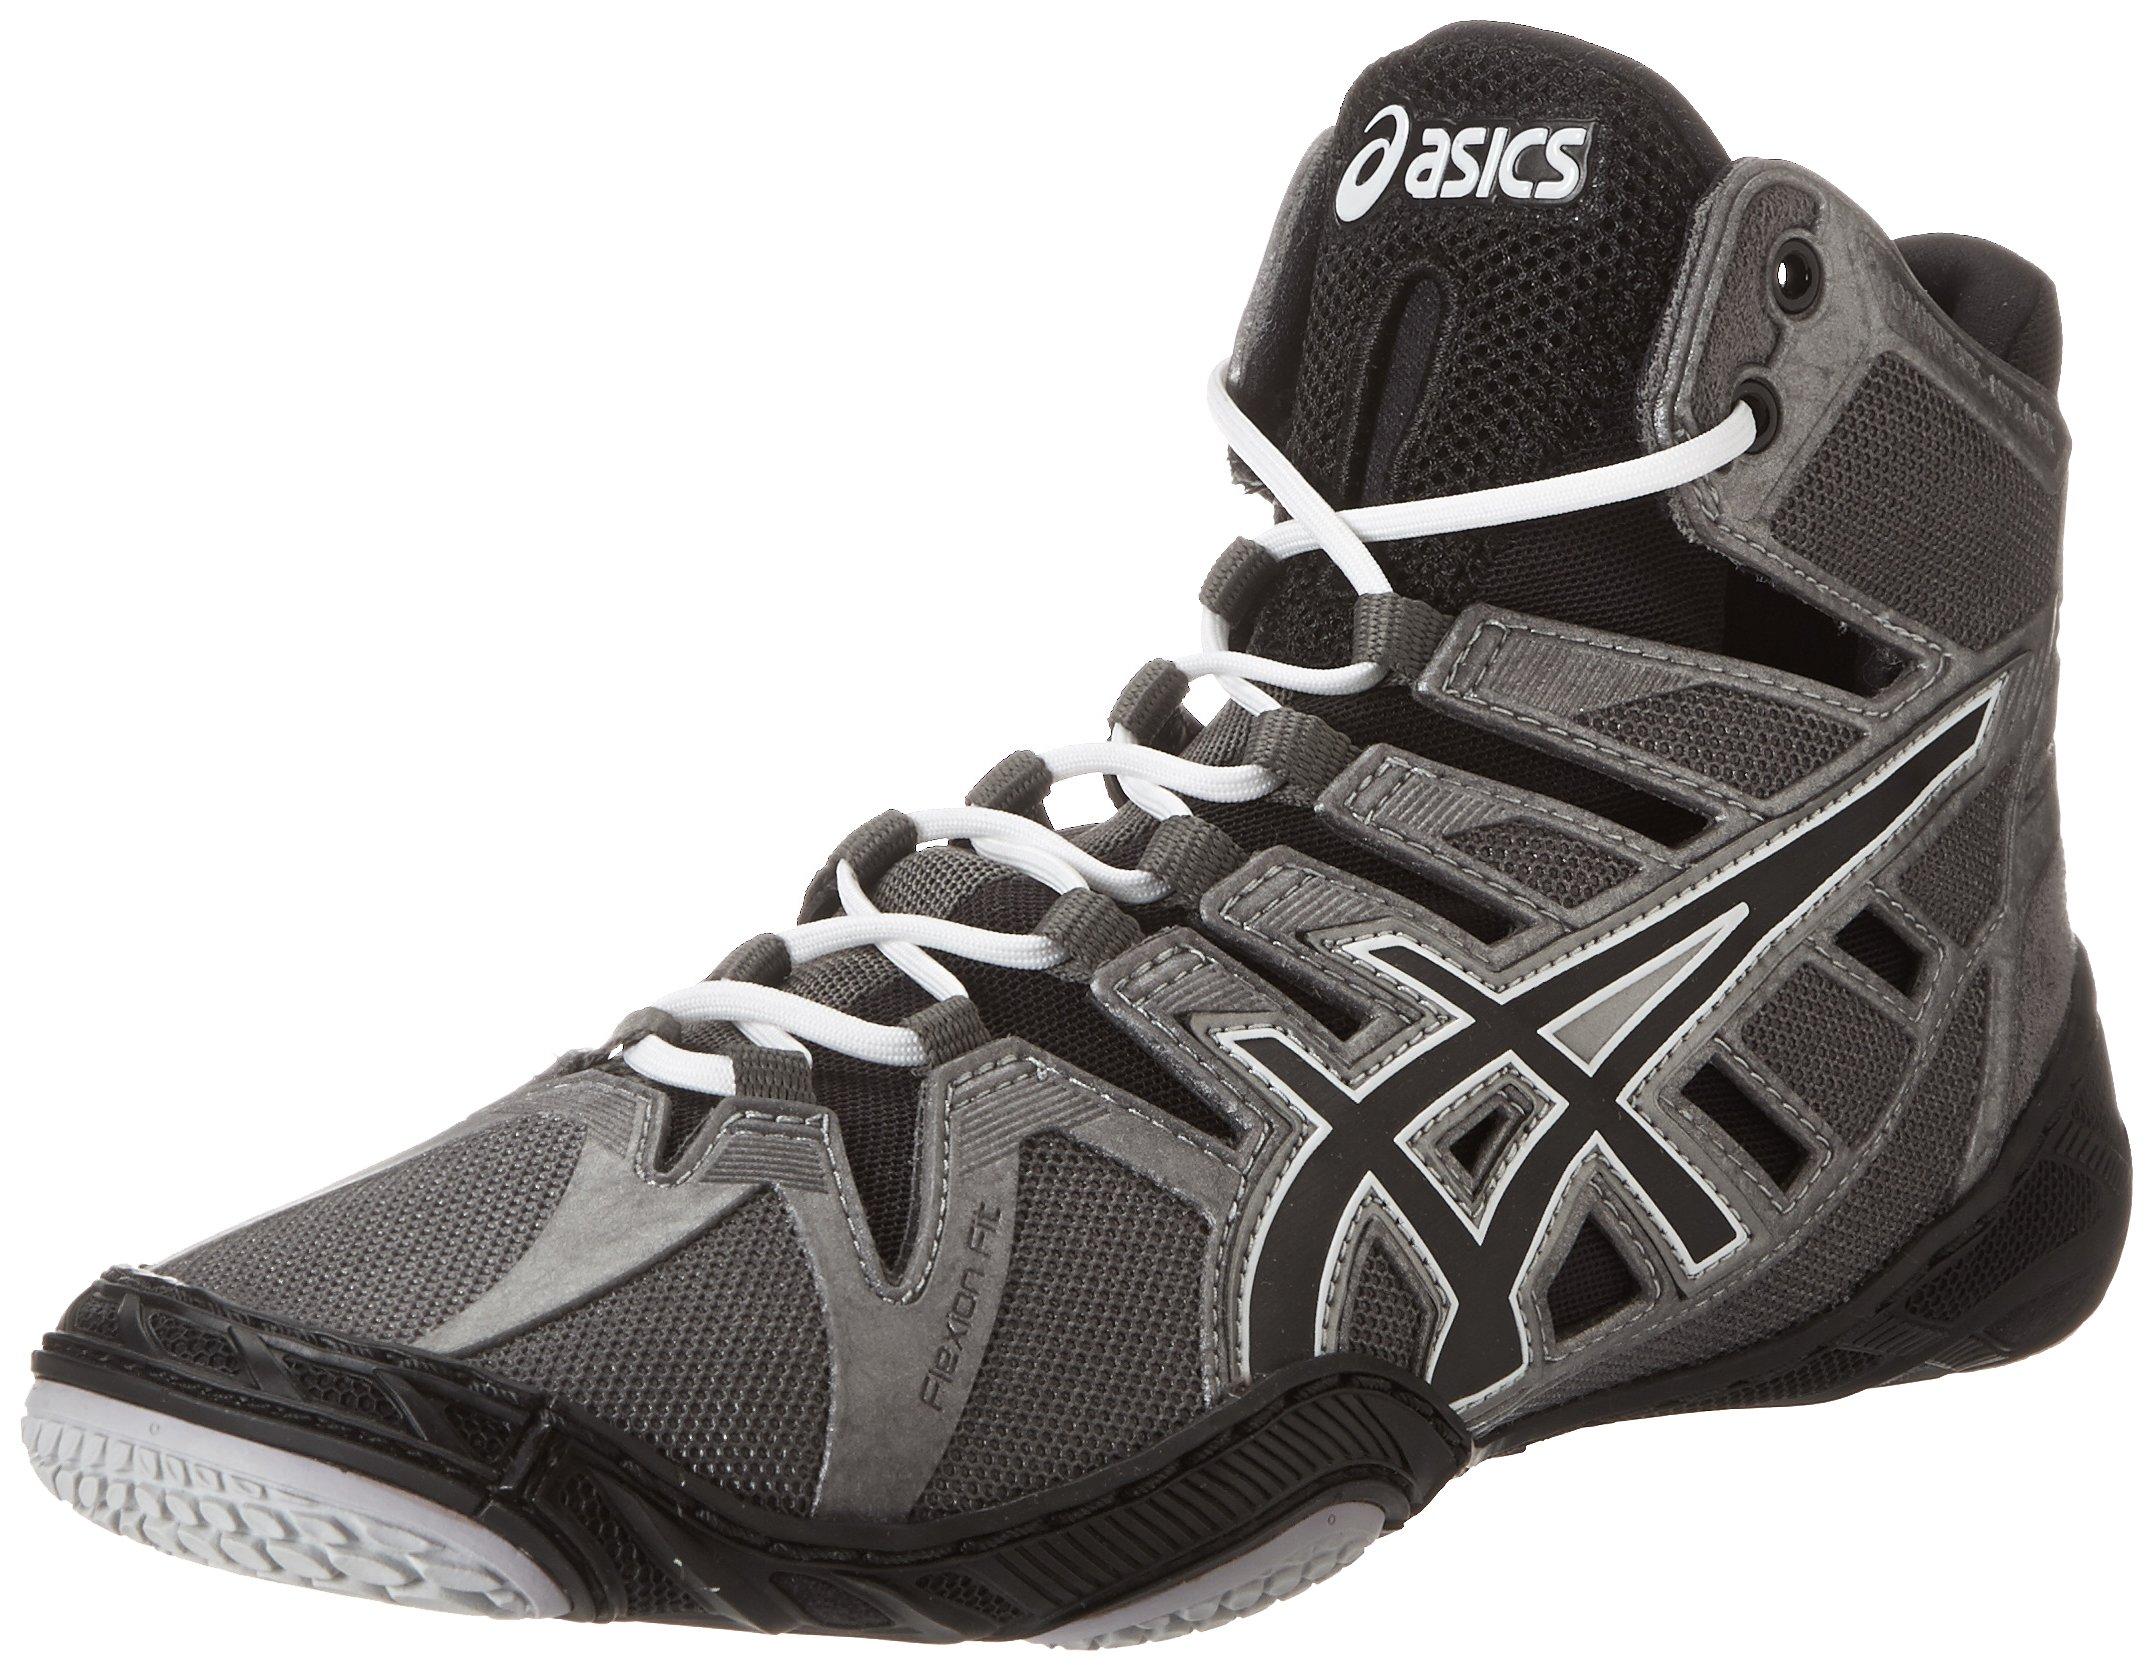 ASICS Men's Omniflex-Attack Wrestling Shoe,Charcoal/Black/White,8.5 M US